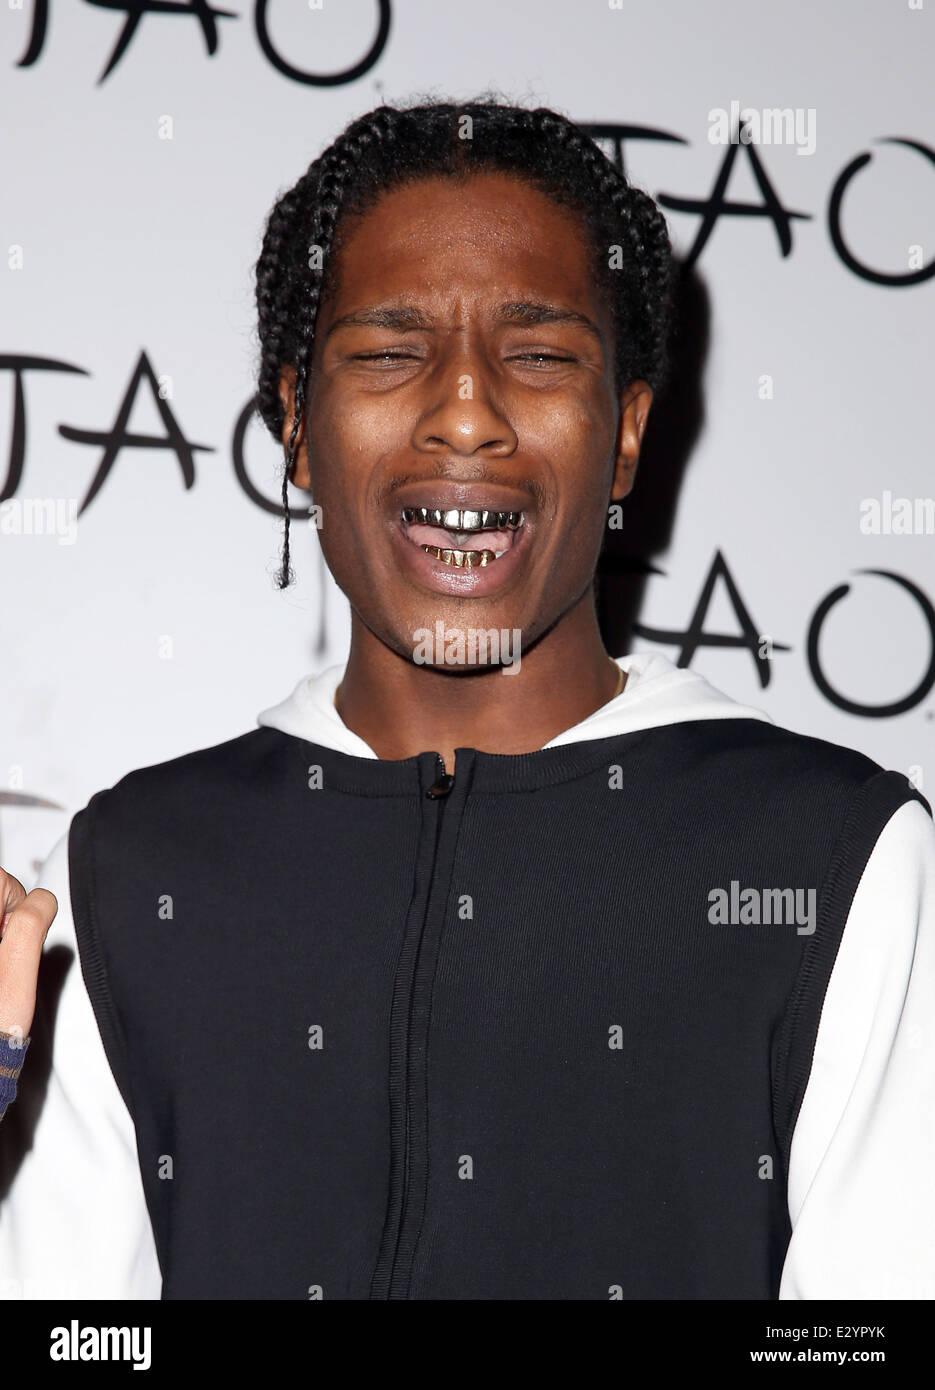 Asap Rocky Before Teeth